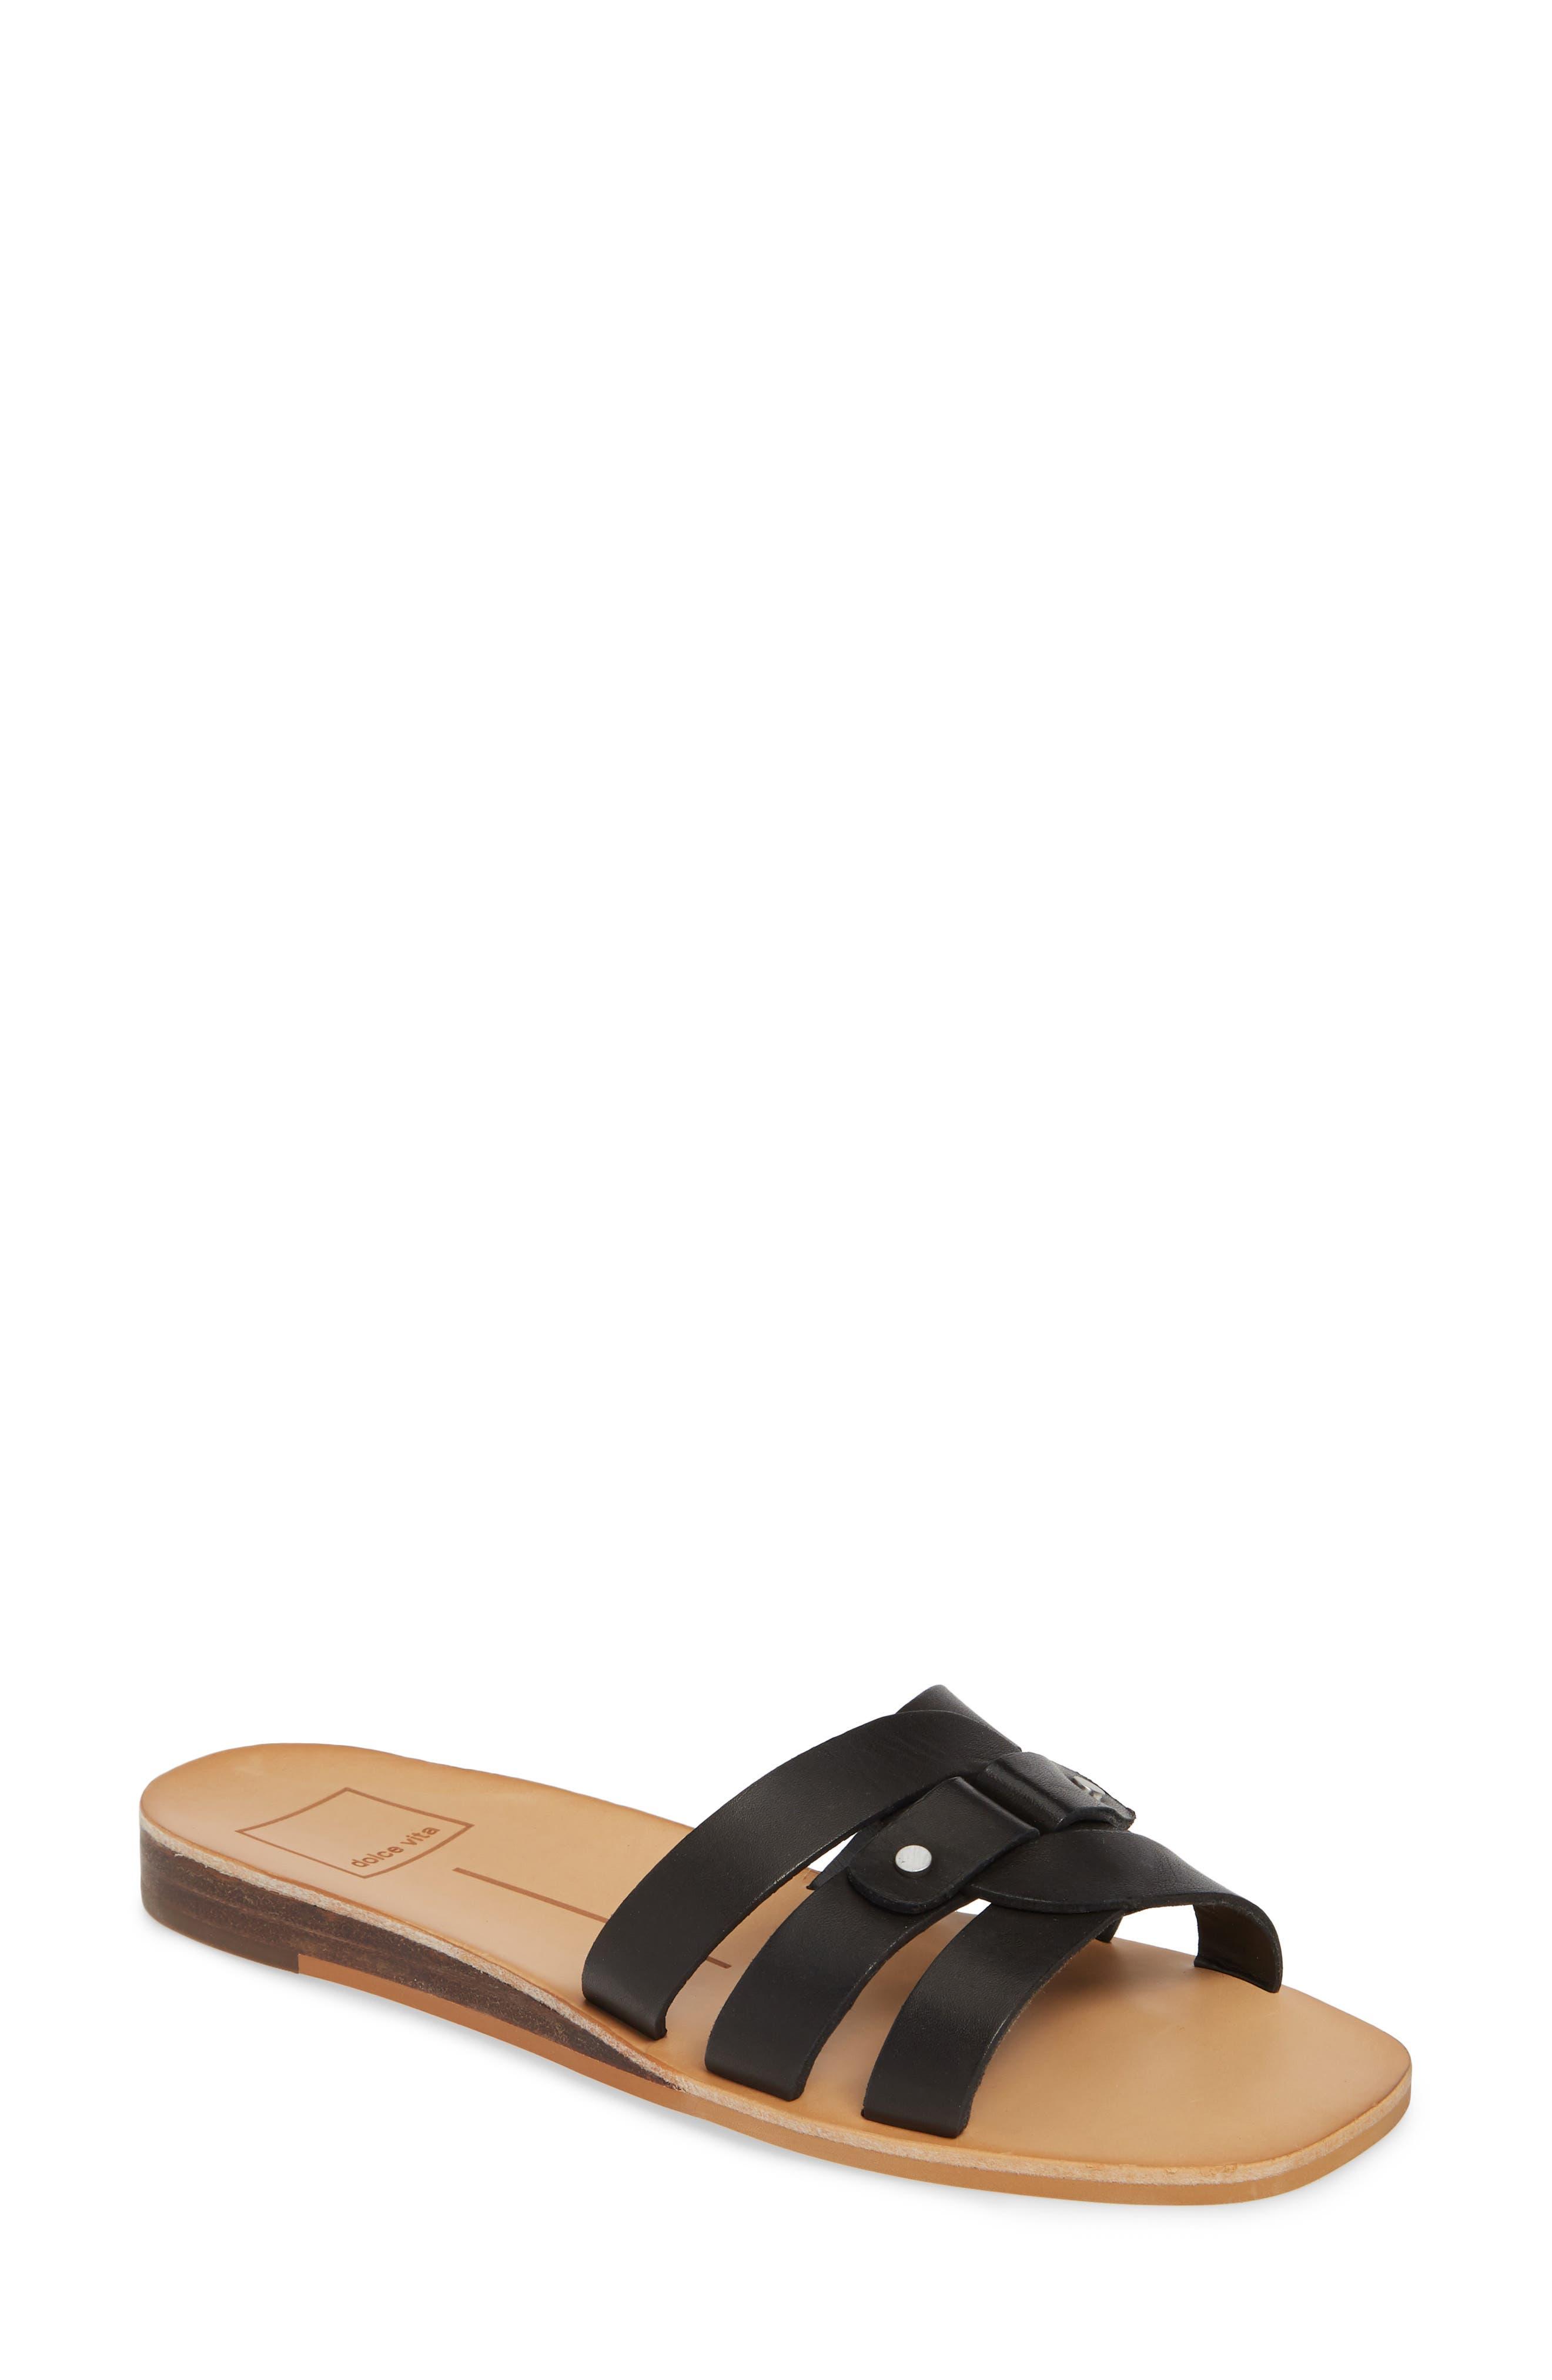 DOLCE VITA, Cait Slide Sandal, Main thumbnail 1, color, BLACK LEATHER